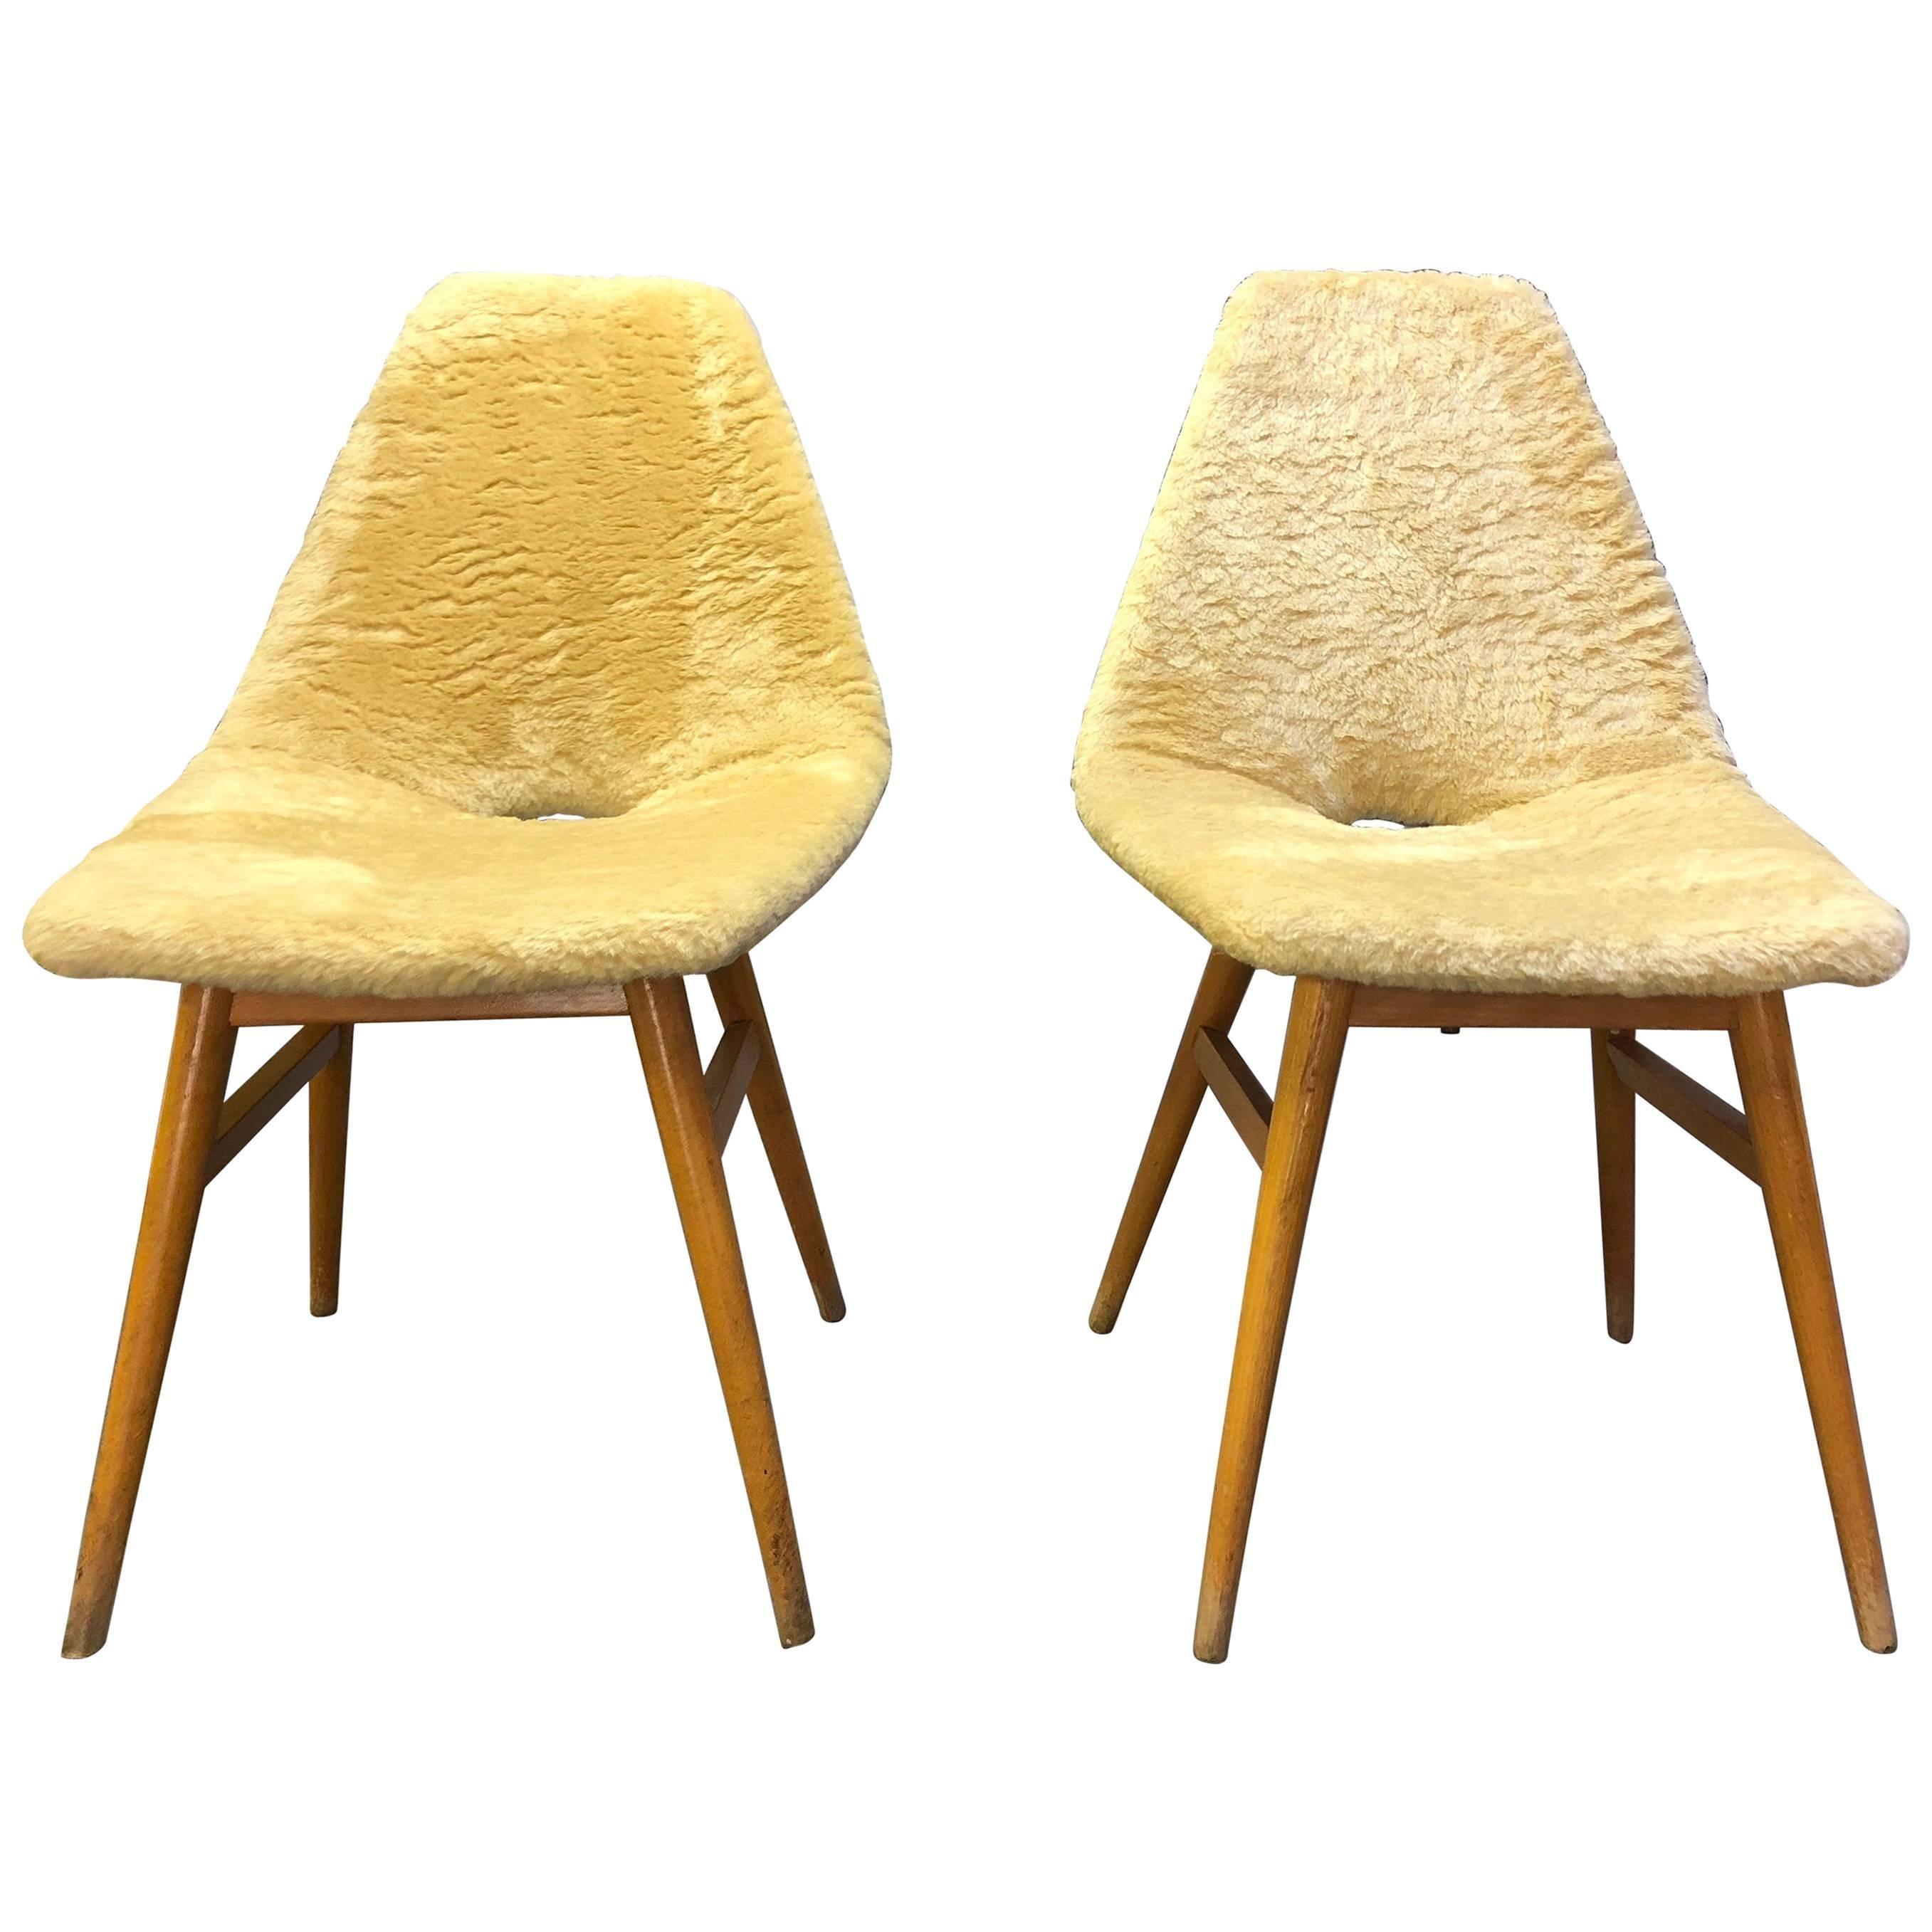 Pair of Side Chairs by Judit Burian & Erika Szek Hungary, circa 1959